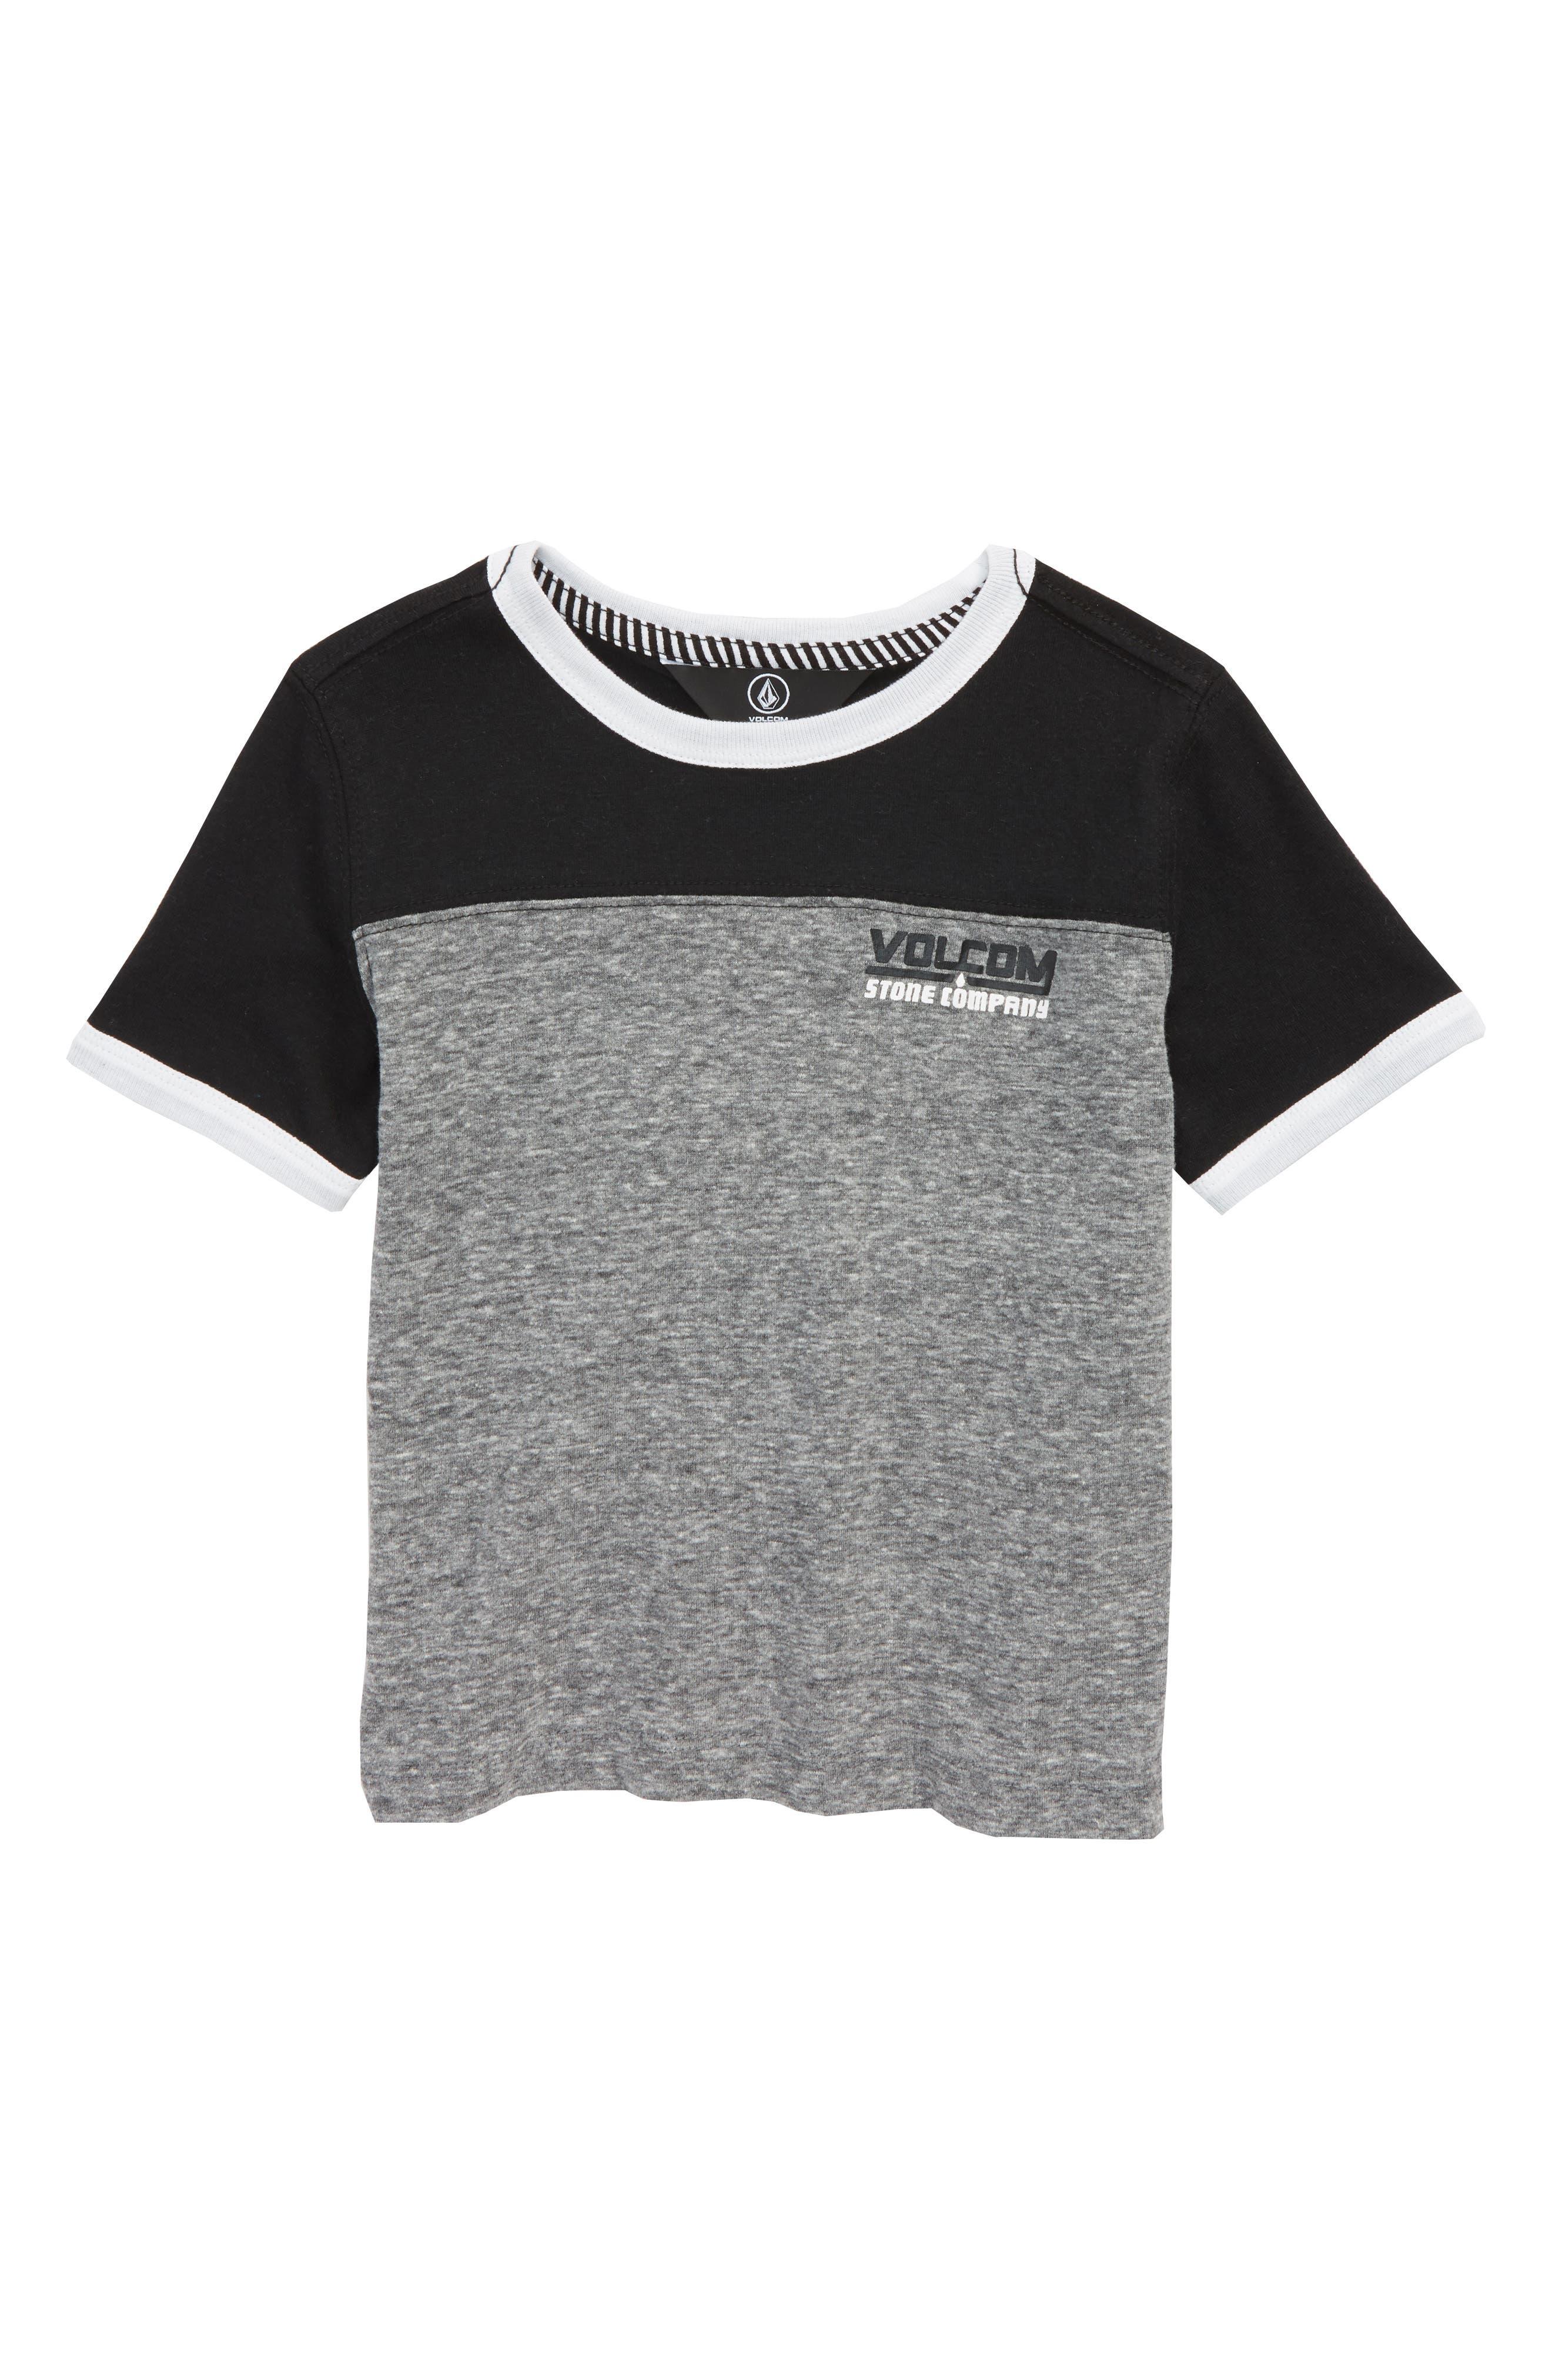 Walden Shirt,                         Main,                         color, 001